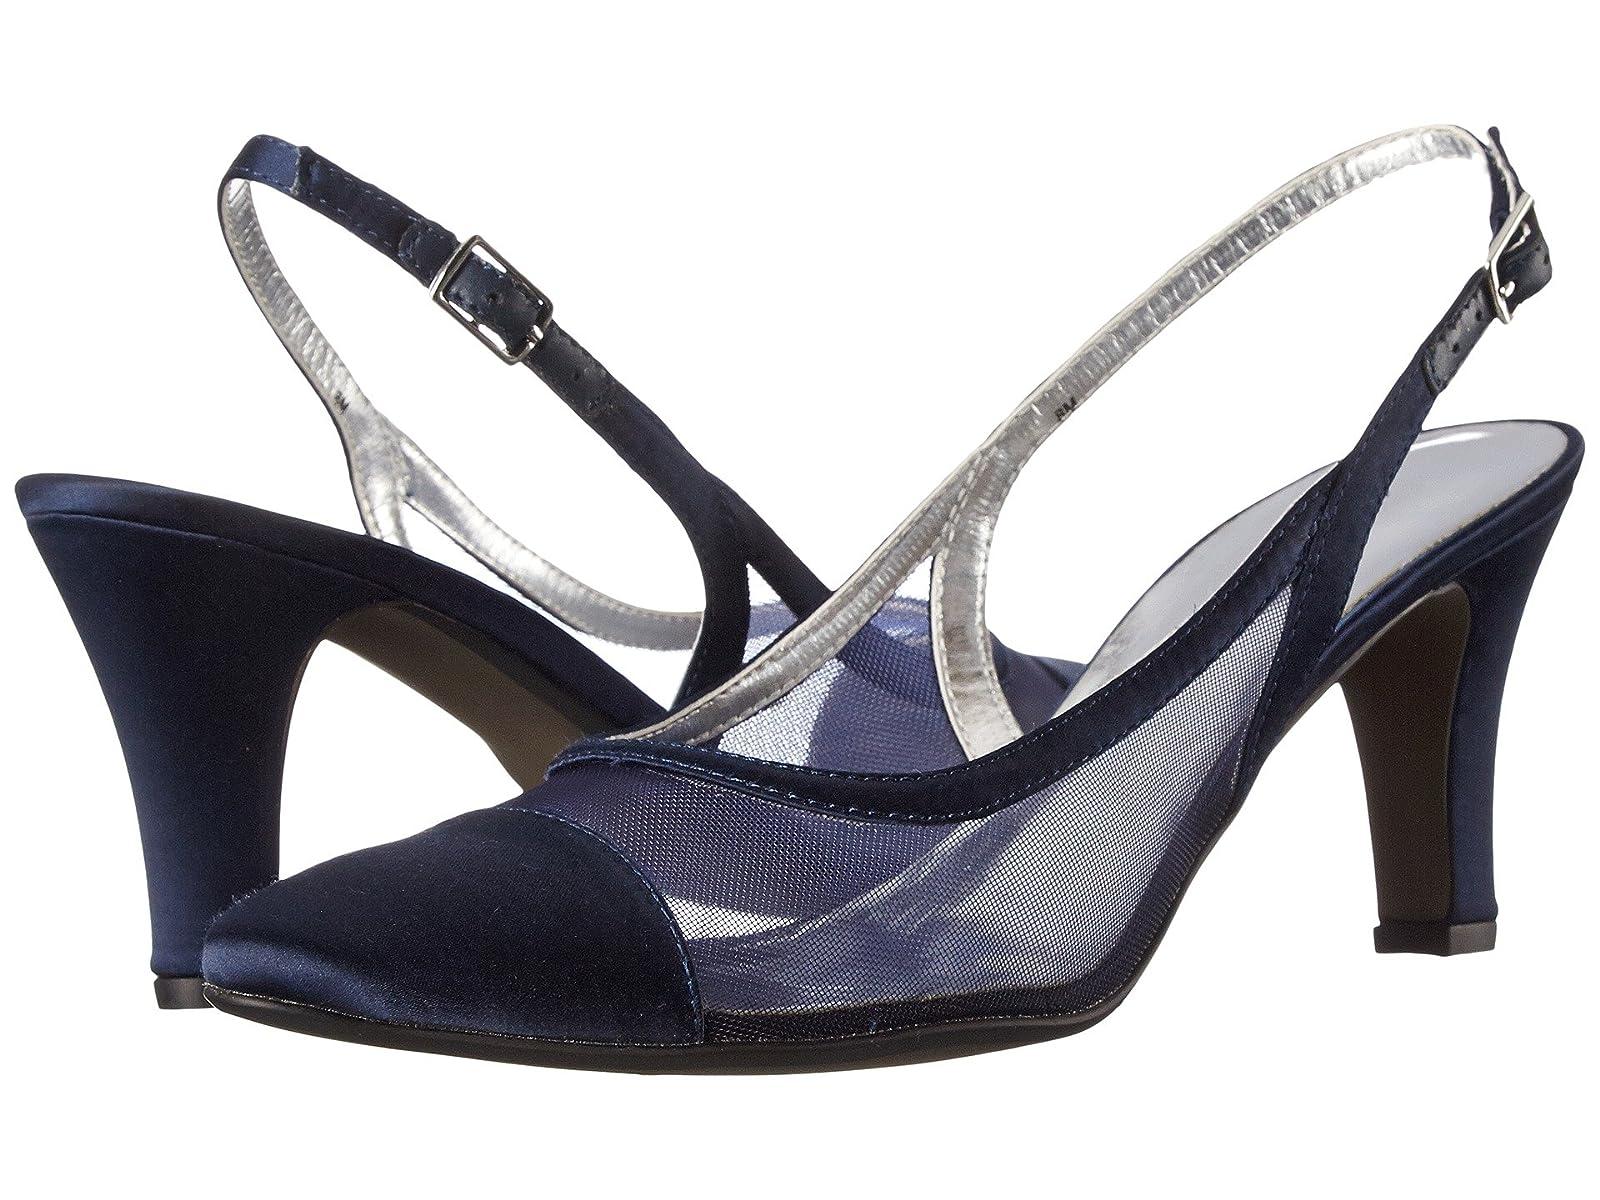 David Tate VegasCheap and distinctive eye-catching shoes